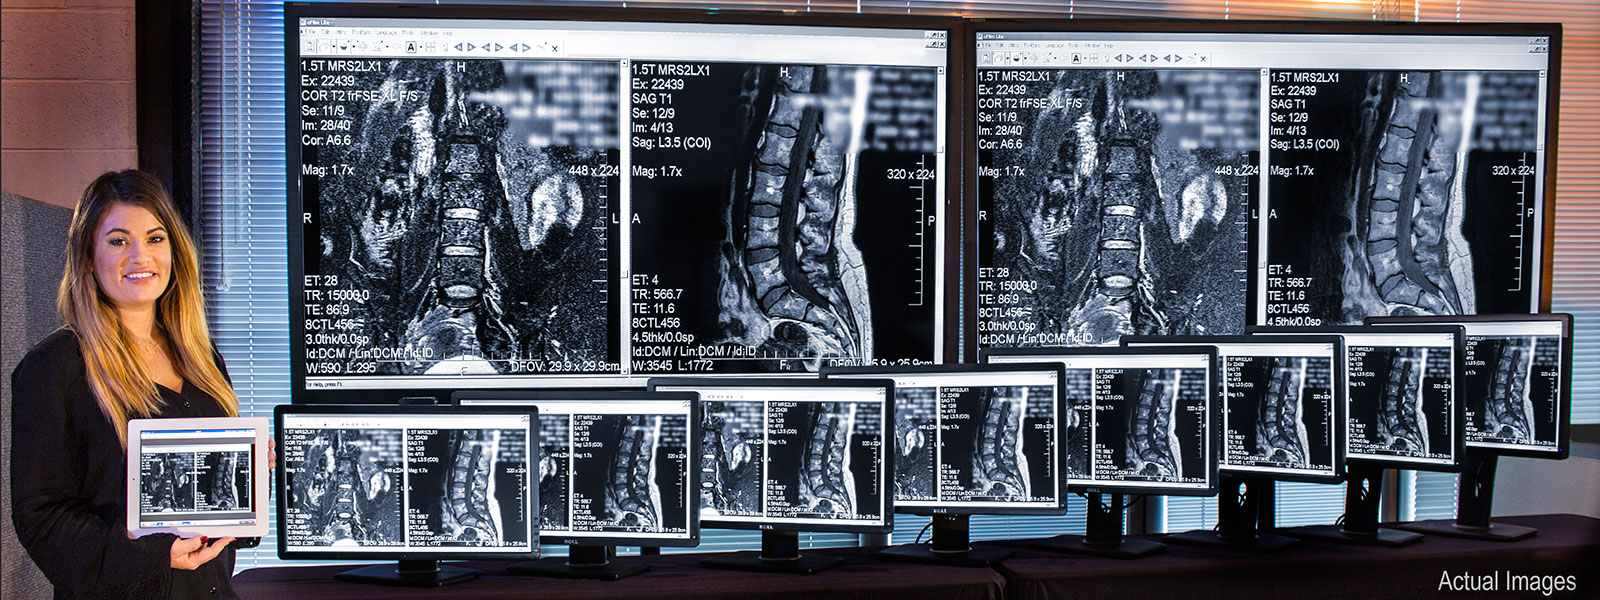 Monitors-HD-MRI